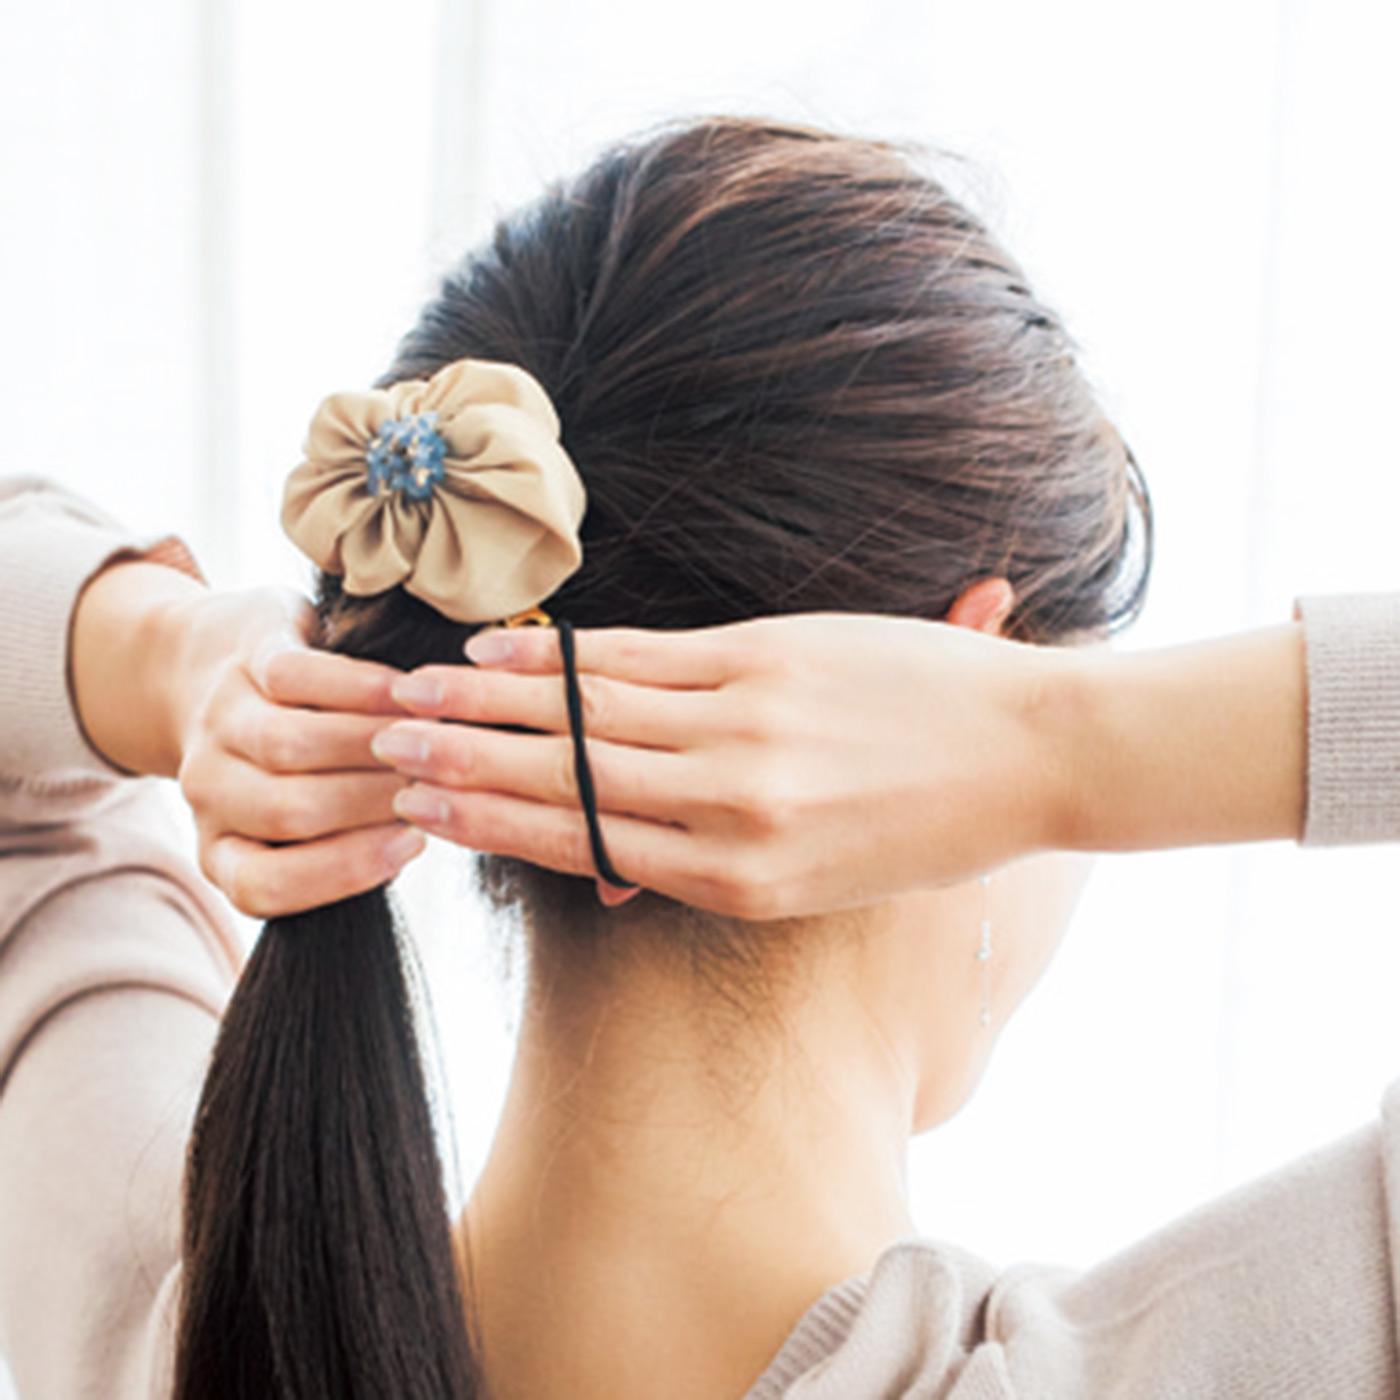 【HOW  TO USE】2.残りの髪を集めてゴム部分で結びます。